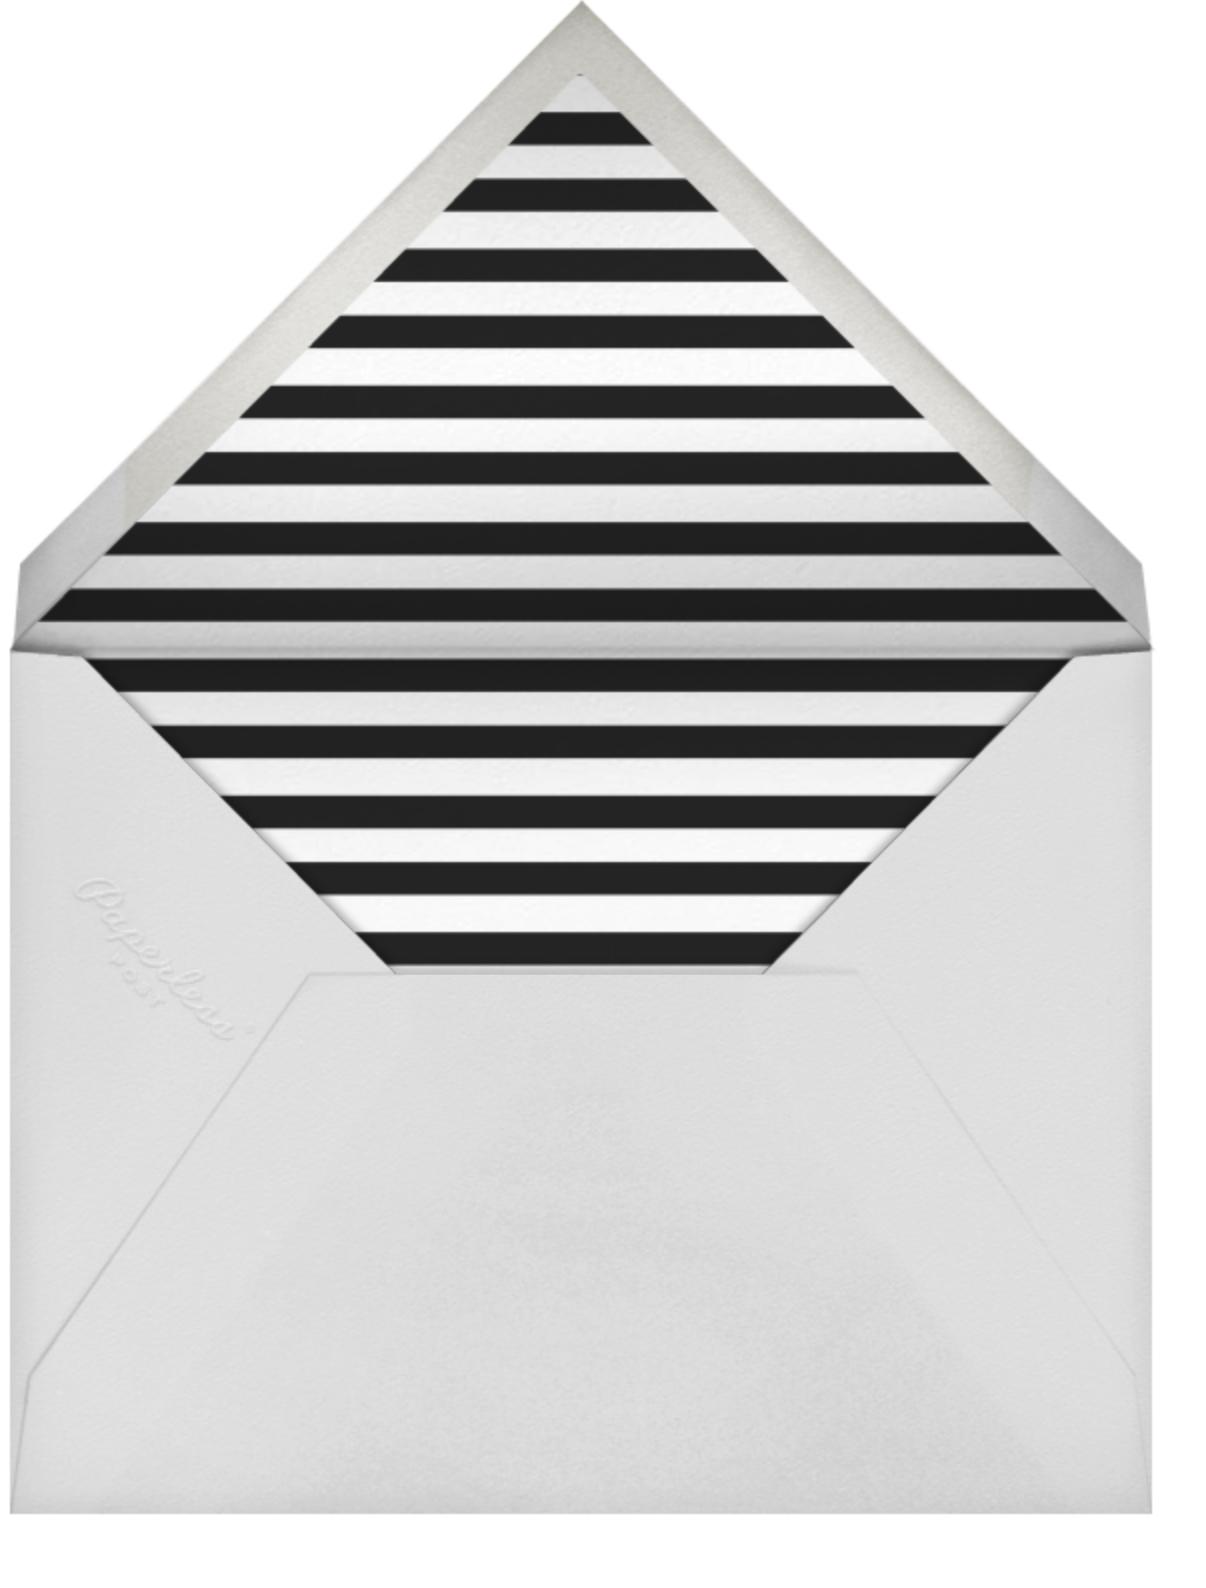 Typographic II (Invitation) - White - kate spade new york - All - envelope back